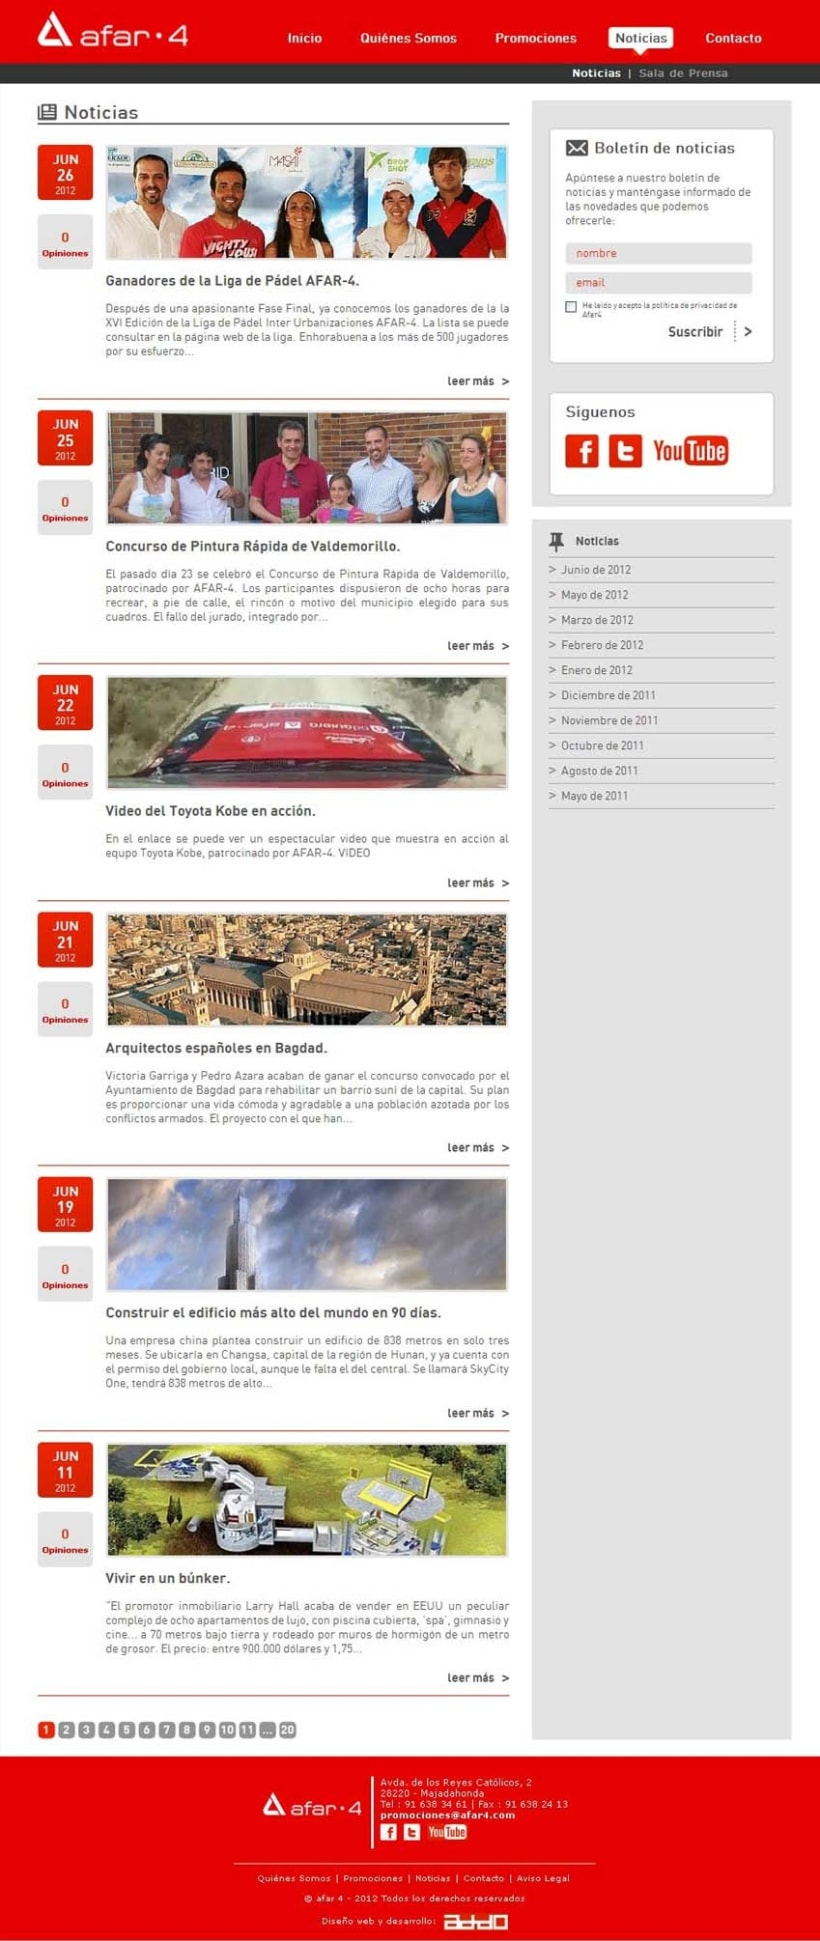 xHTML + CSS + Javascript + PHP + MySQL + CMS (Gestor de Contenidos) - Afar4 Promociones 4